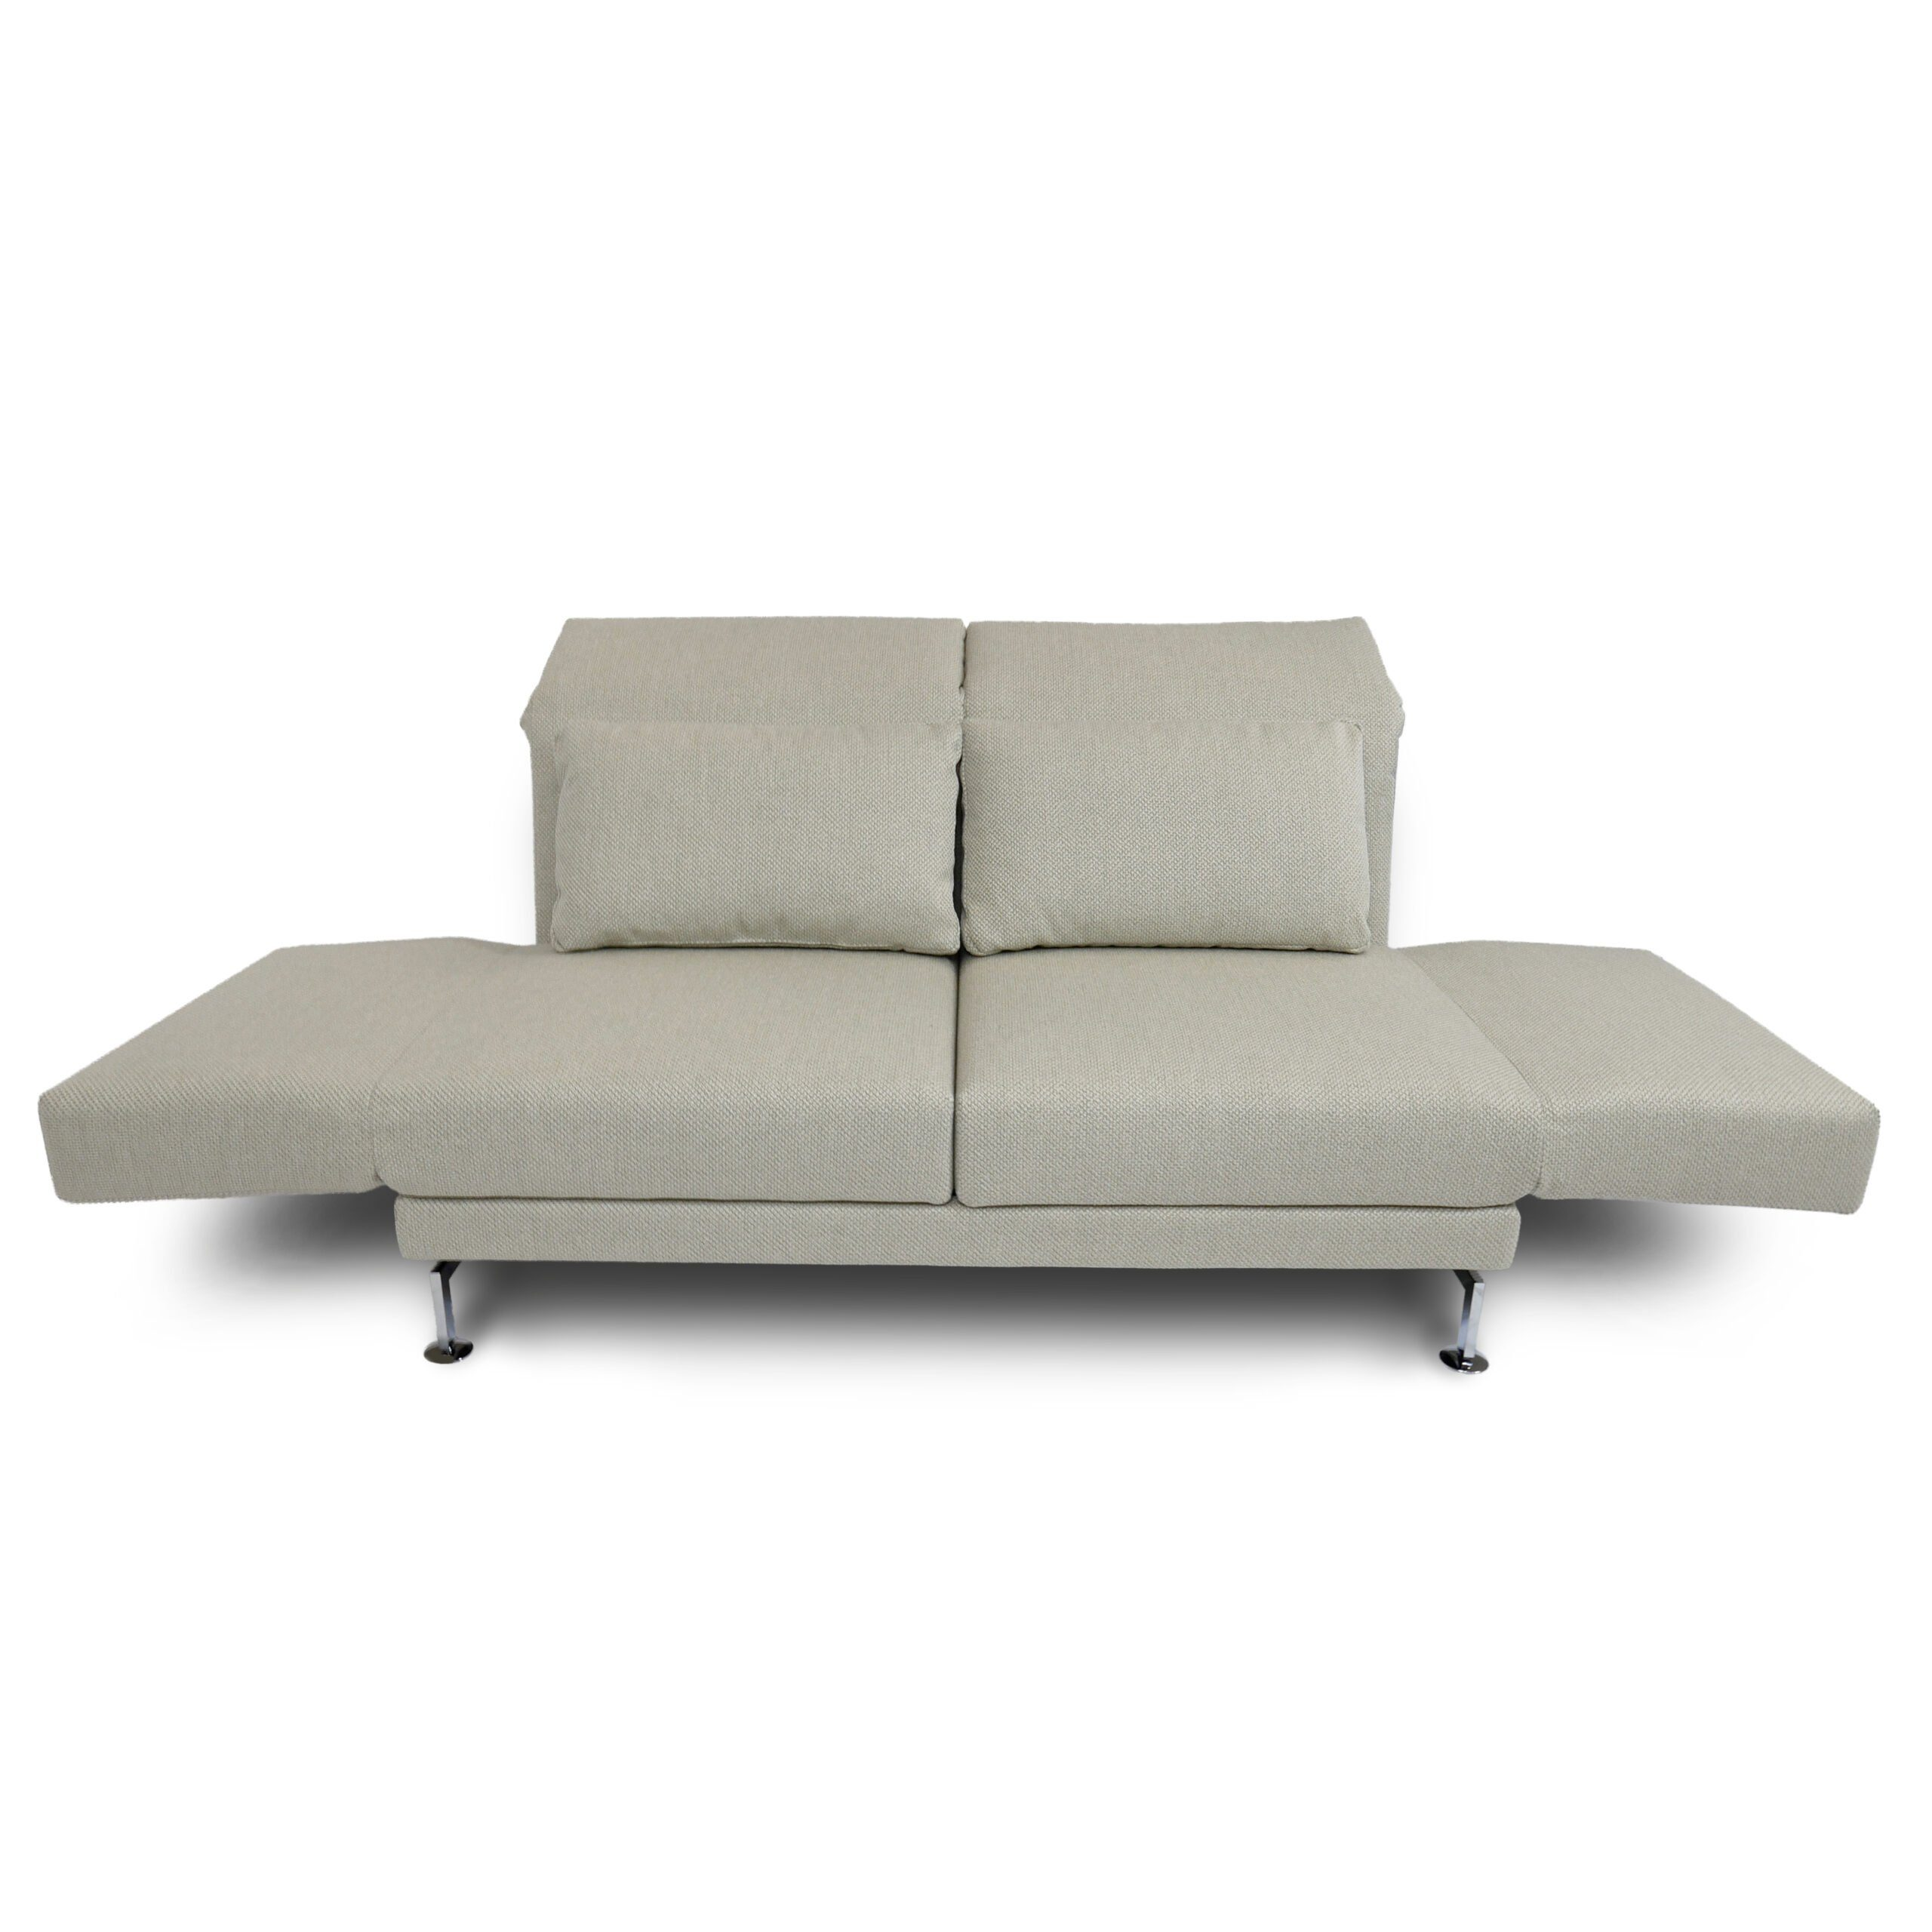 Bruhl Moule Medium 2 Sitzer Sofa In Wollweiss Wohnparc De